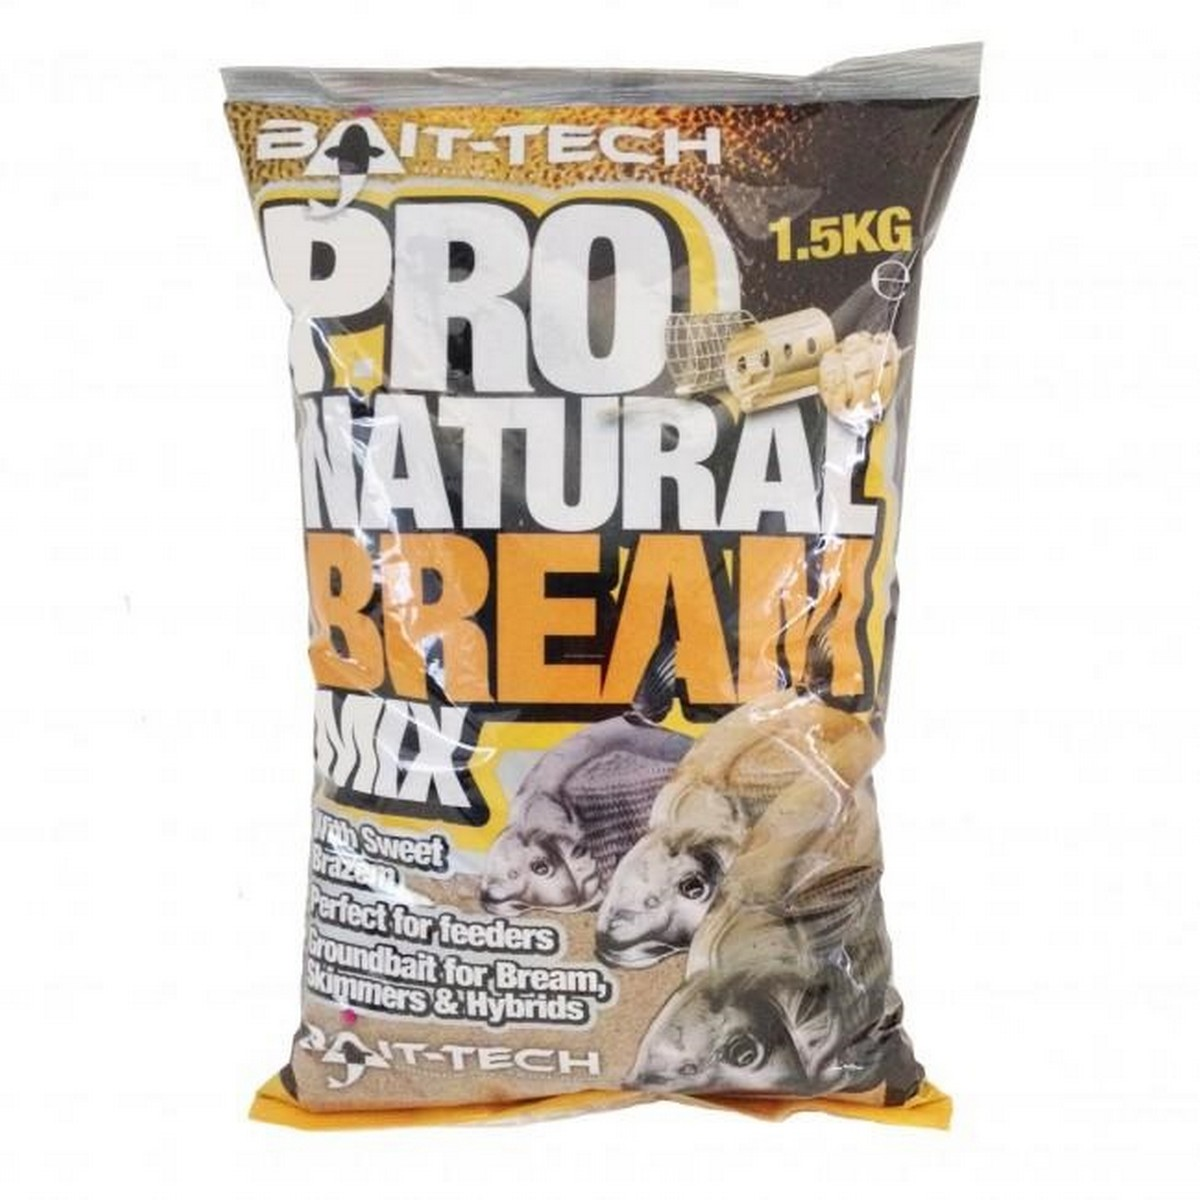 Захранка Bait-Tech Pro Natural Bream Groundbait 1.5kg